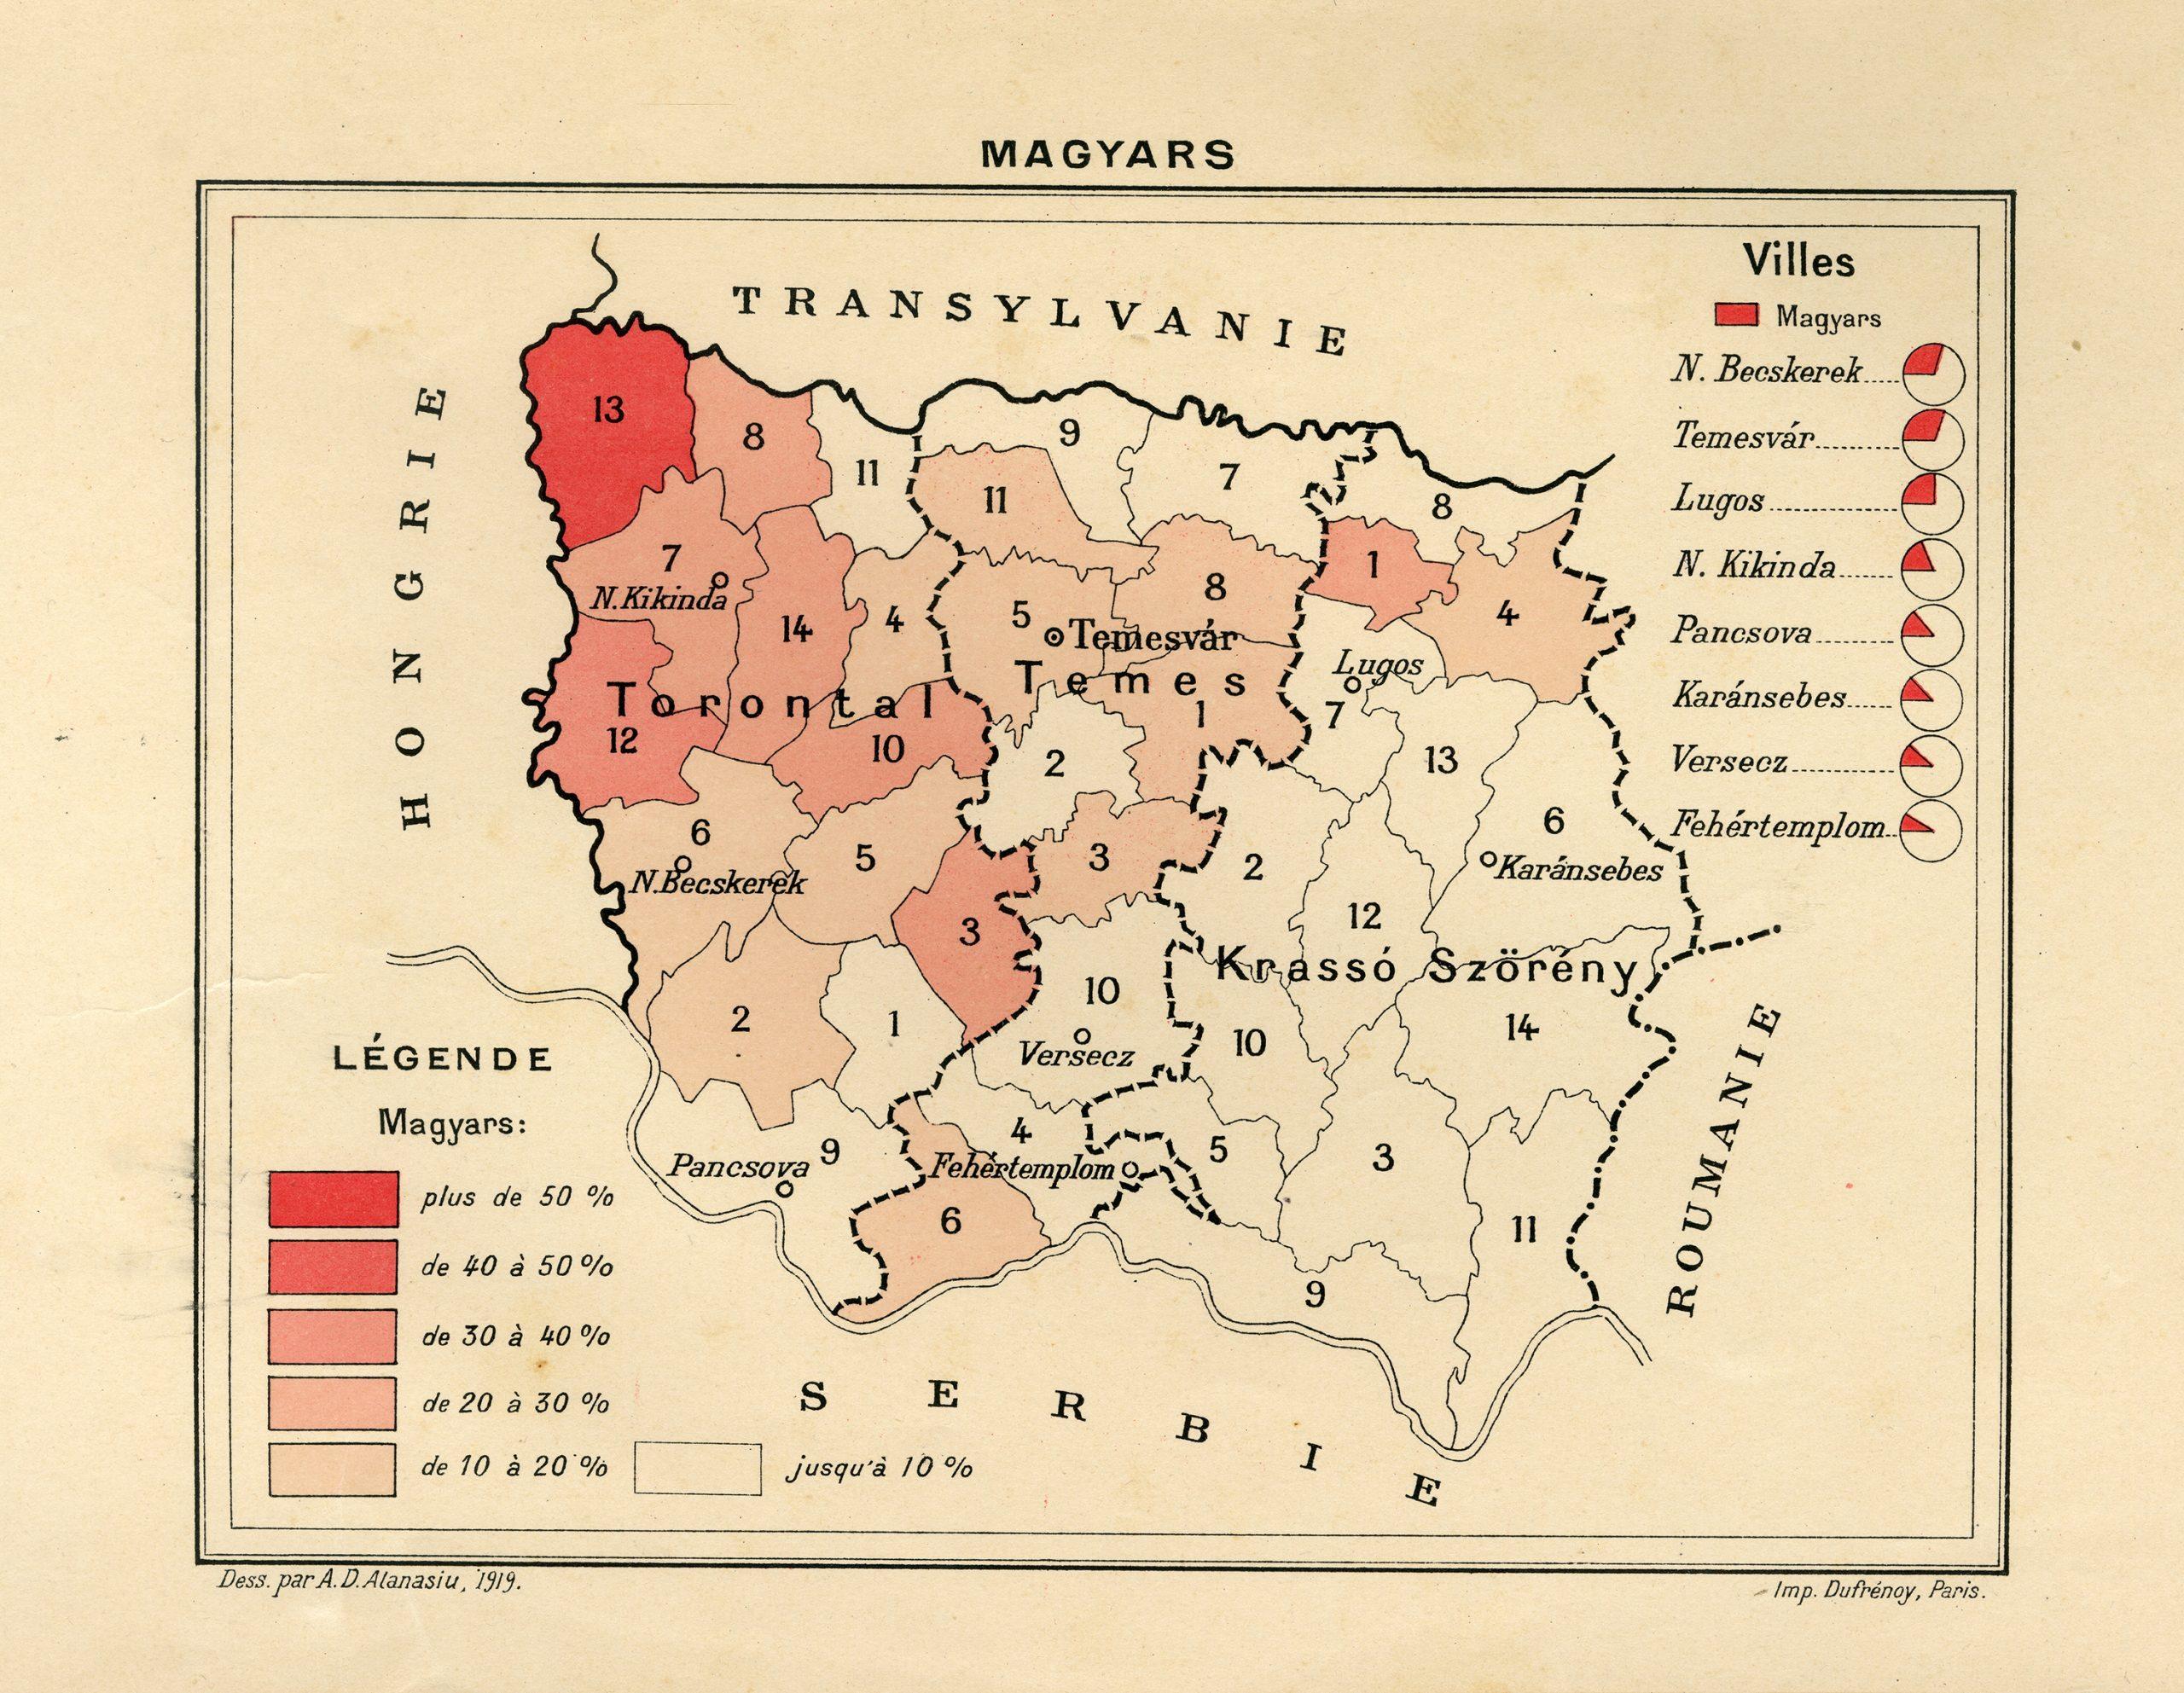 Harta Banatului – Magyars, Imprimerie Dufrenoy, Paris